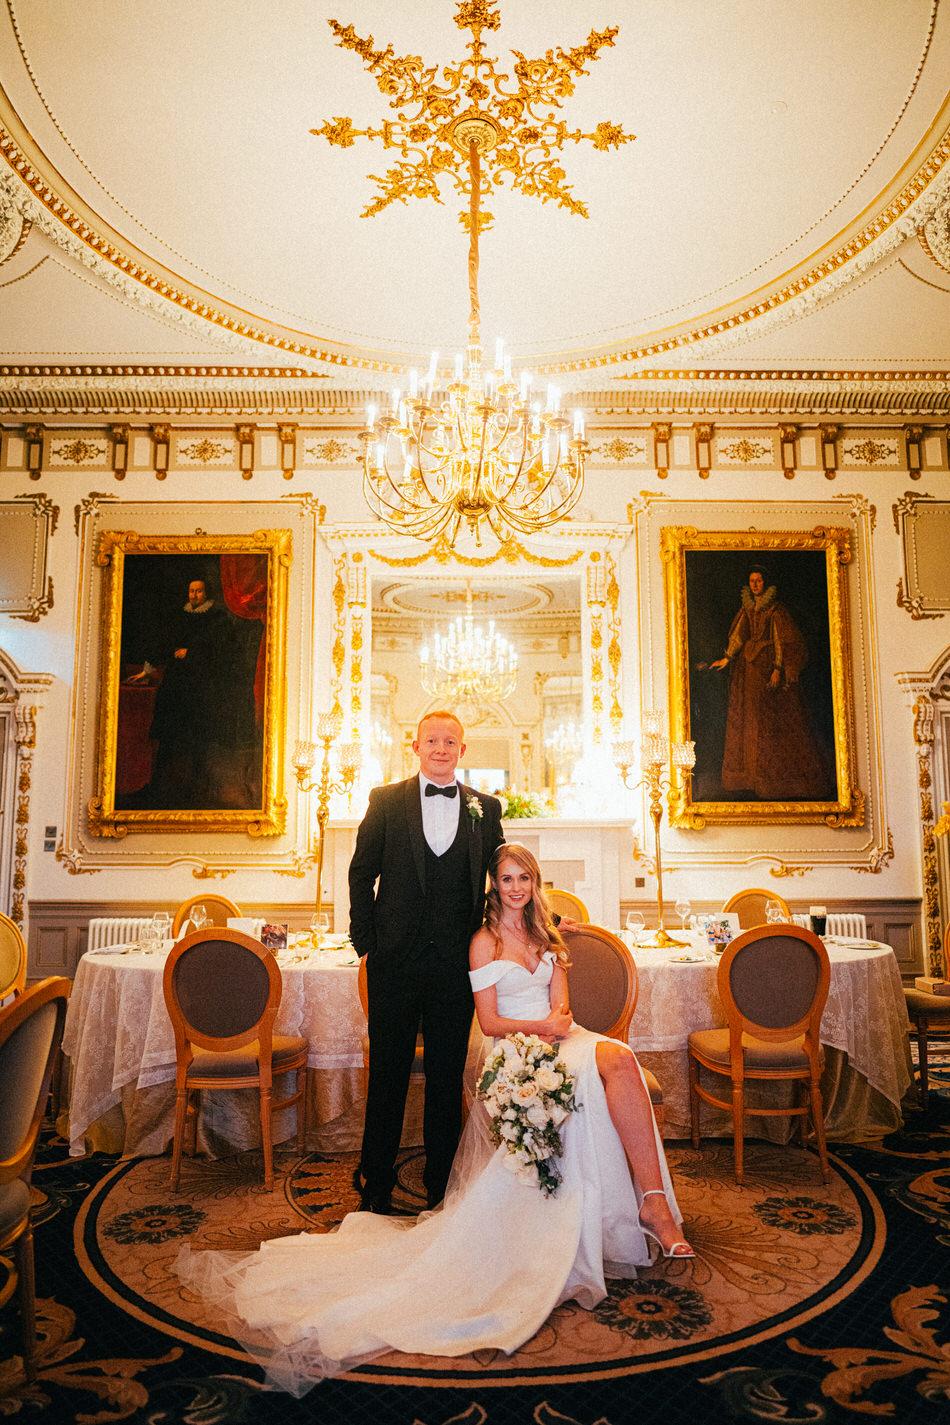 Castle-wedding-ireland-photos- 0256 194